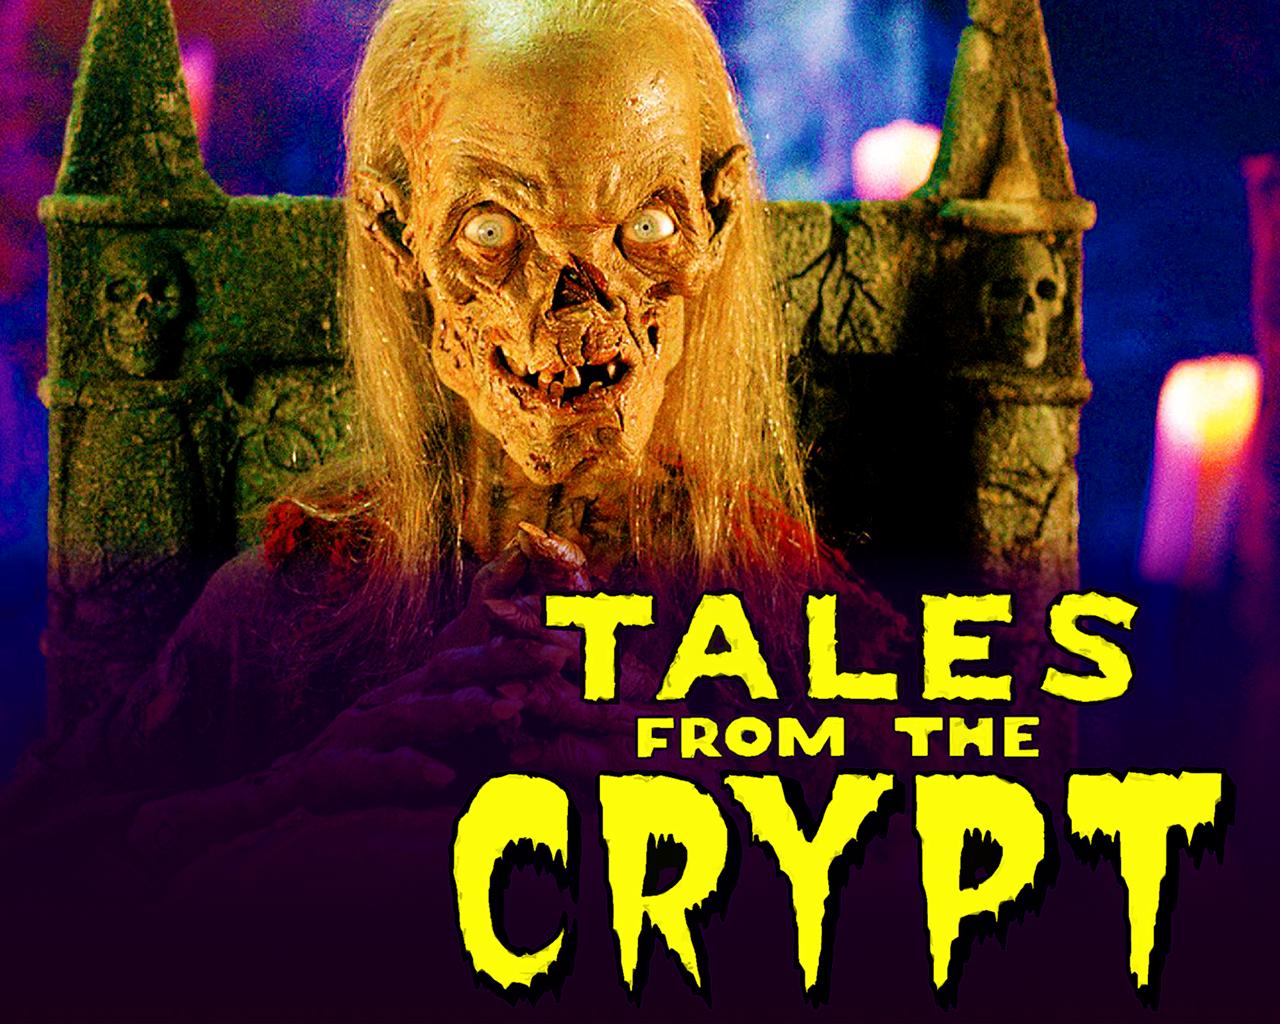 Tales From The Crypt Tales From The Crypt Wallpaper 40705988